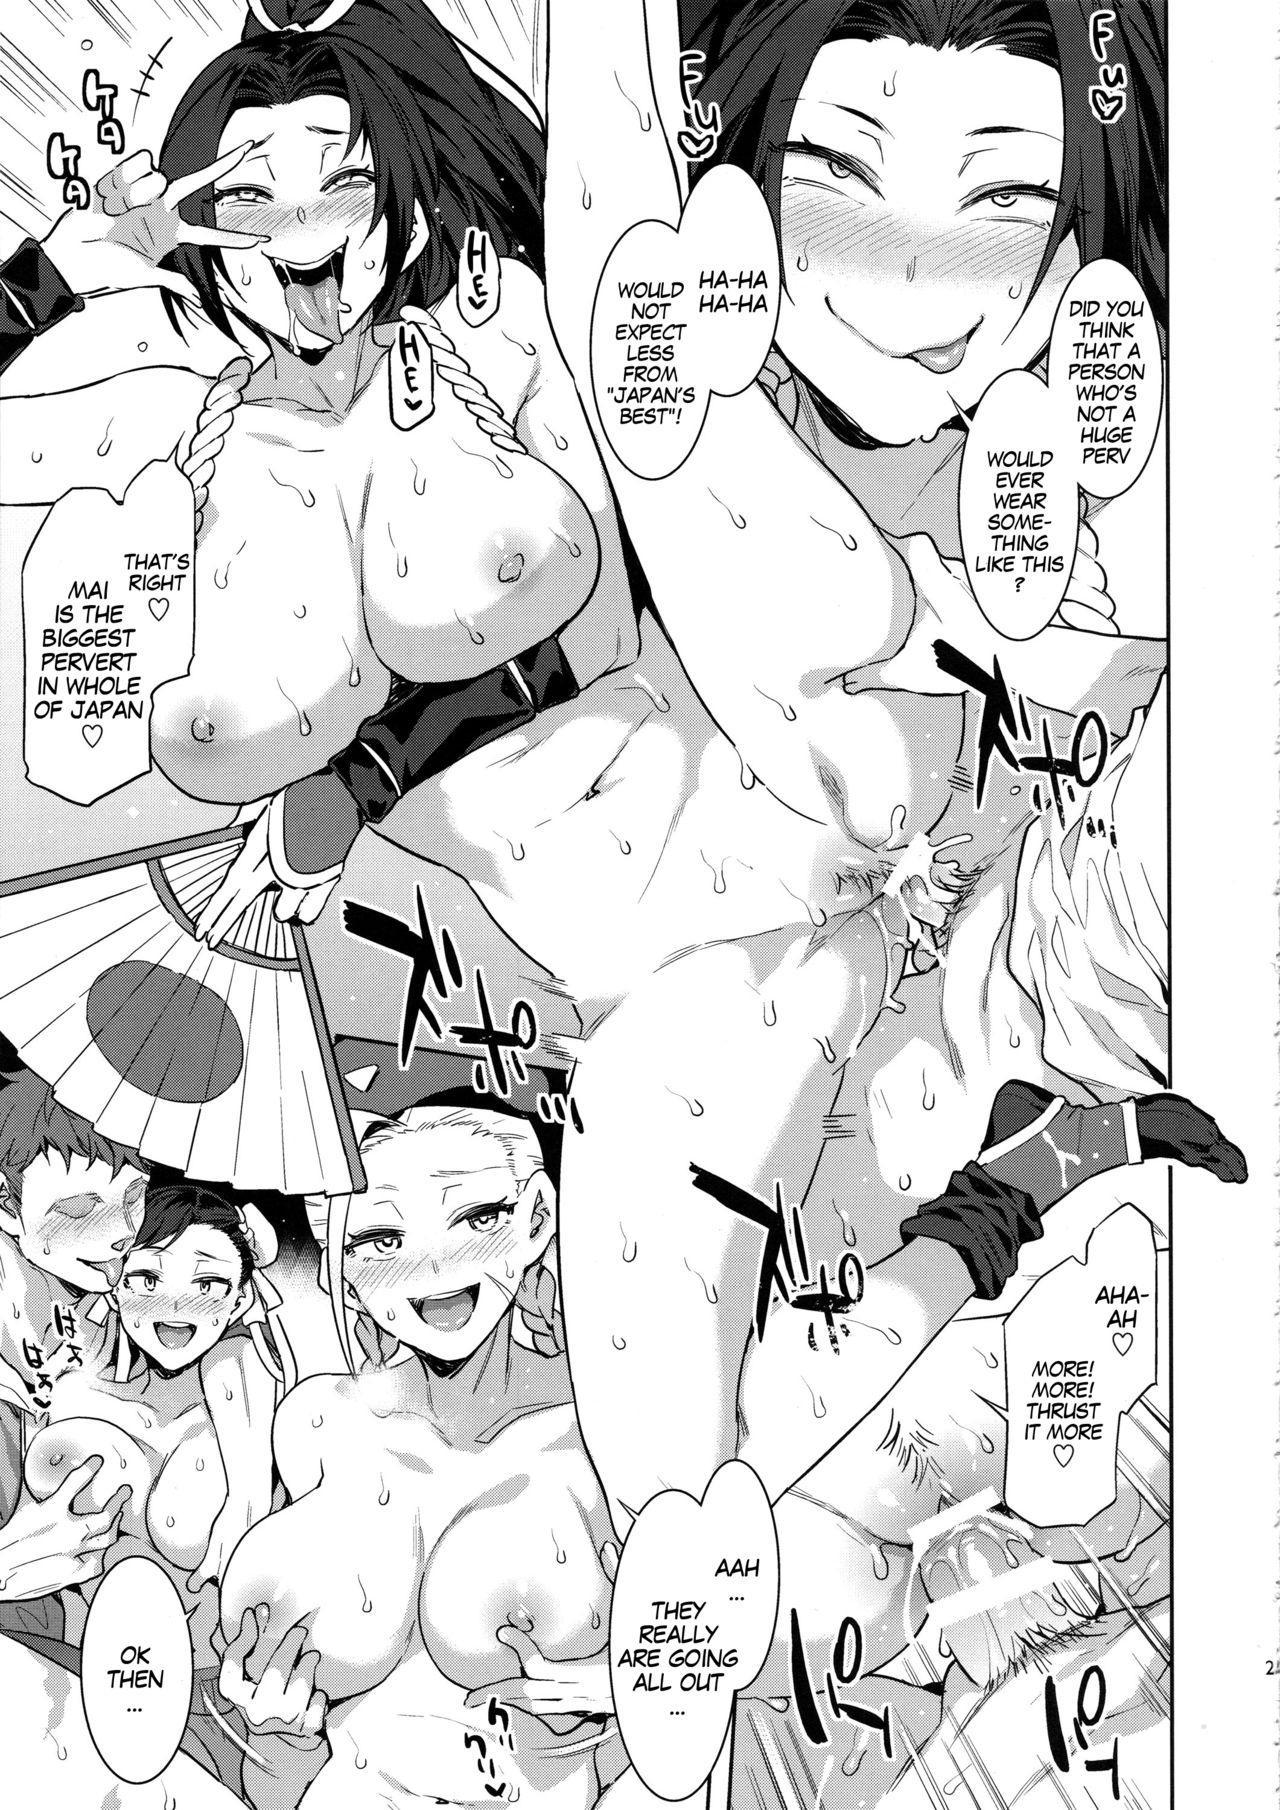 Kakutou Musume Yarimoku Goukon | Casual Sex Party With Fighting Game Gals 23